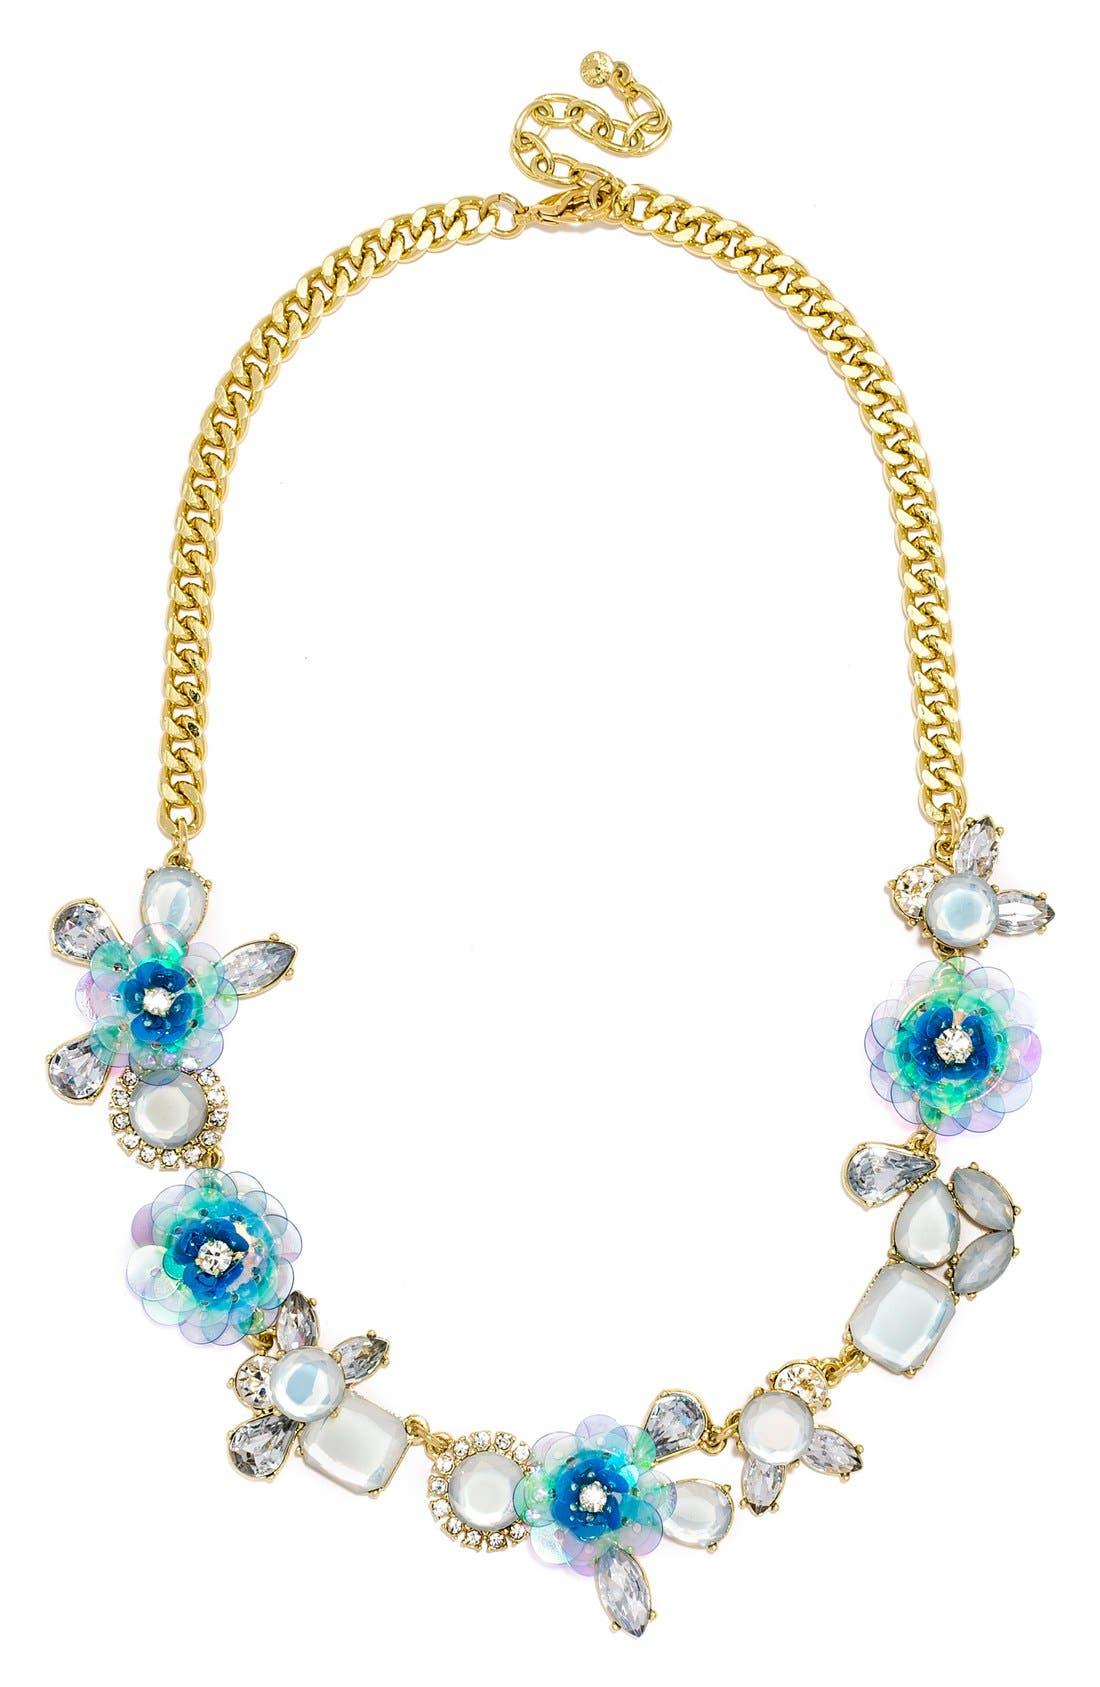 Alternate Image 1 Selected - BaubleBar 'Kiara' Collar Necklace